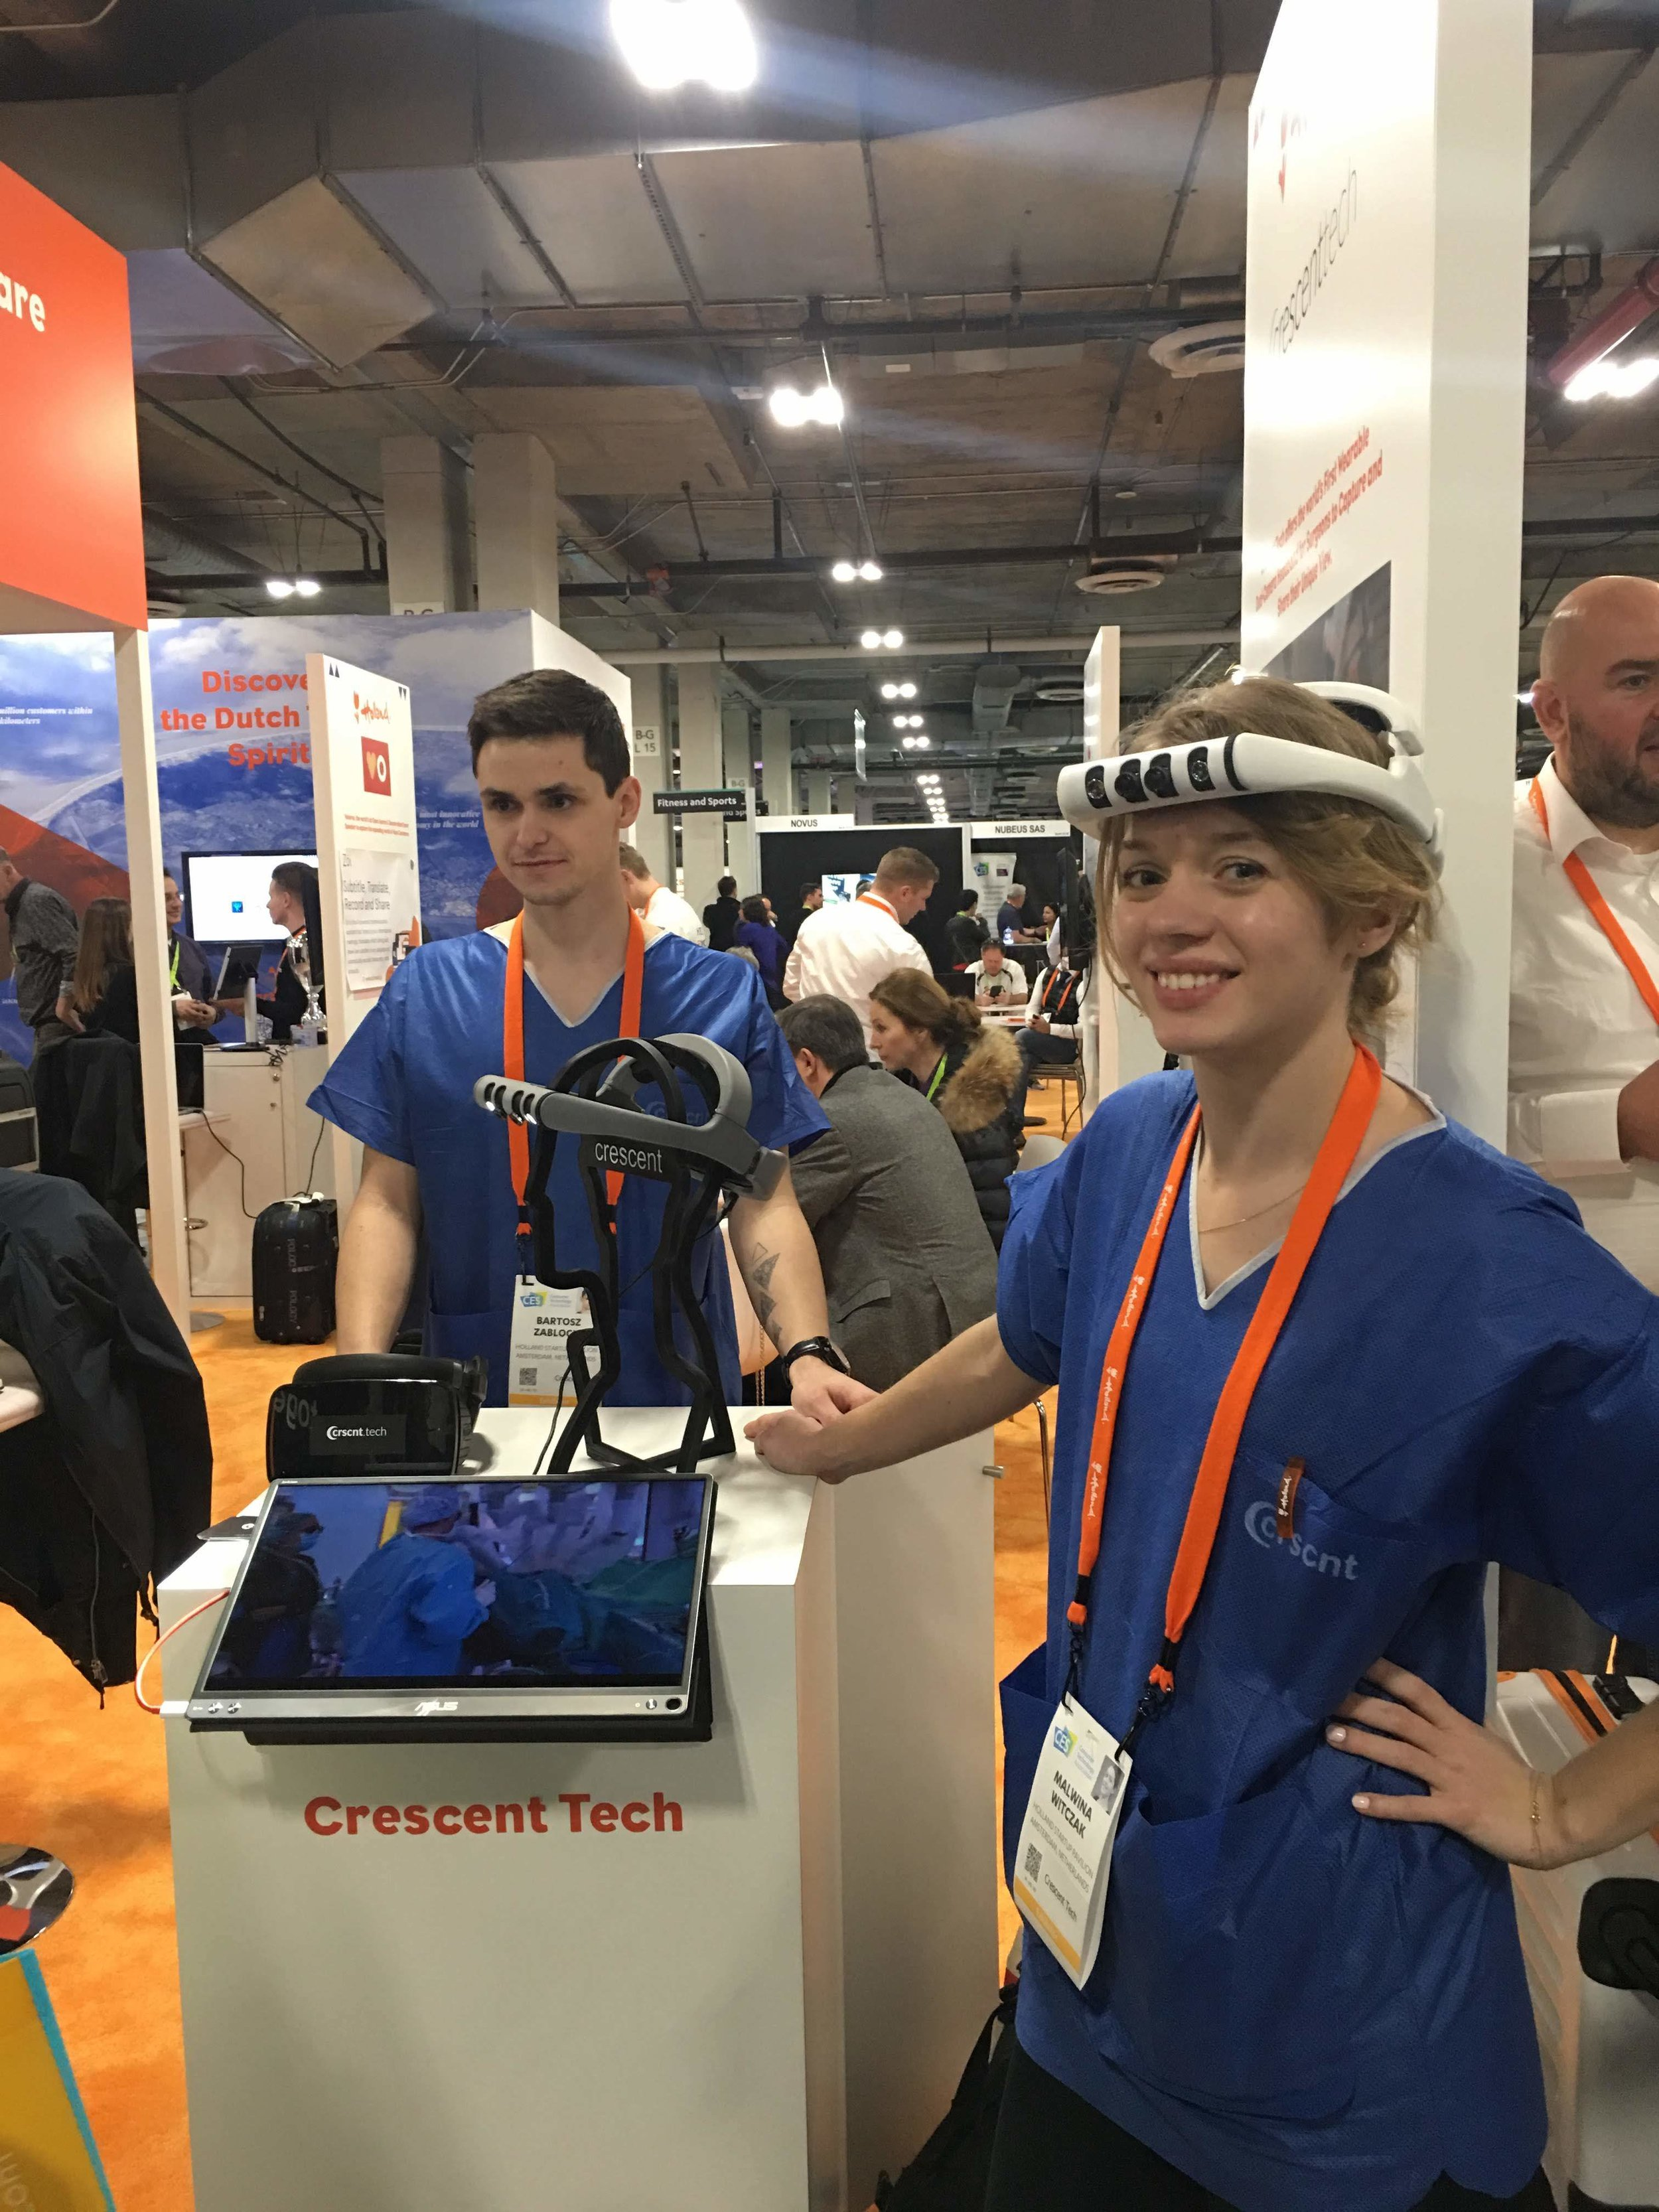 Bartosz and Malwina presenting Crescent Tech at CES2019